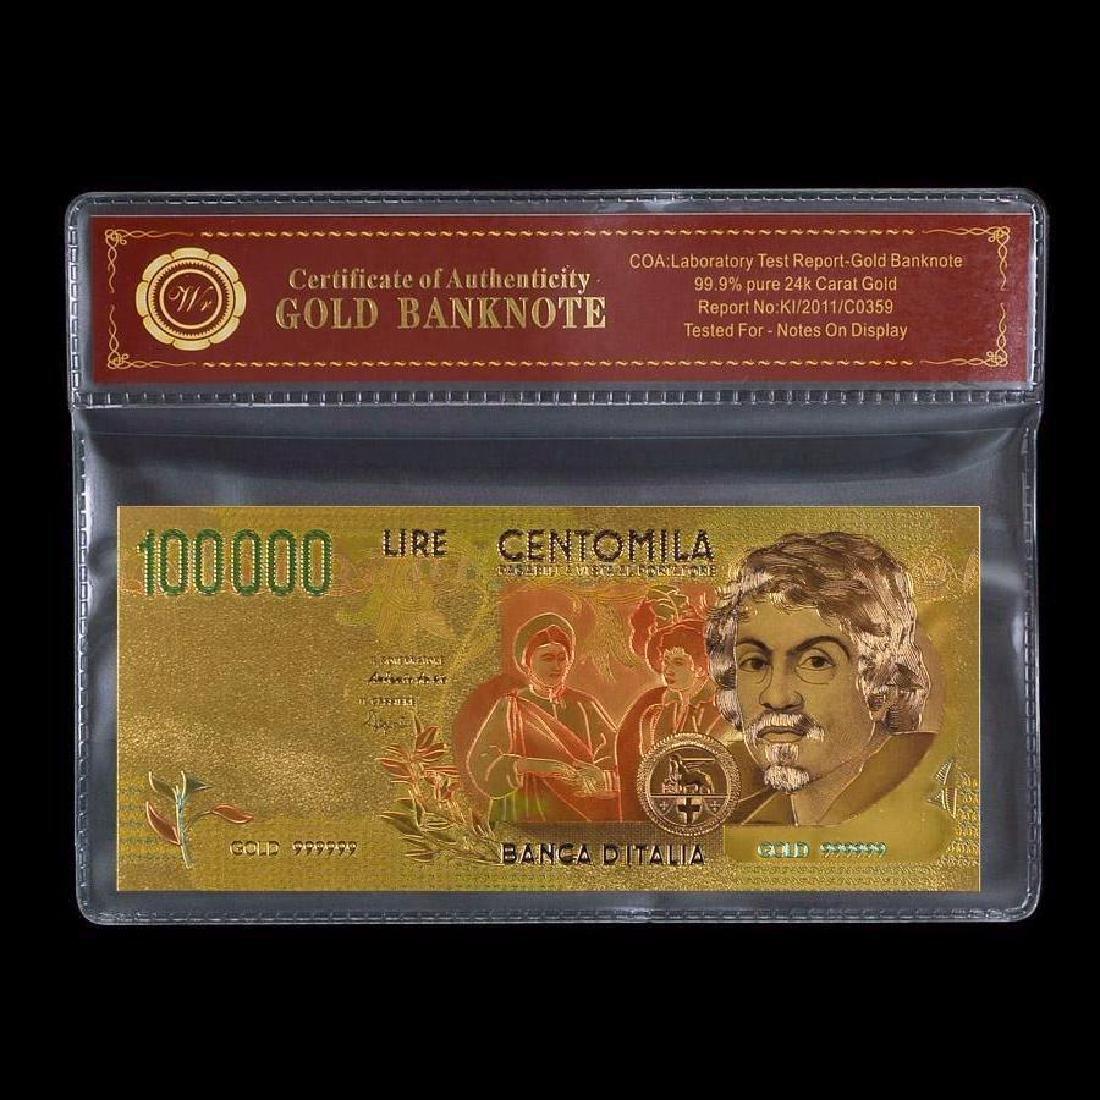 Italy 100,000 Lira 24K Gold Clad Banknote